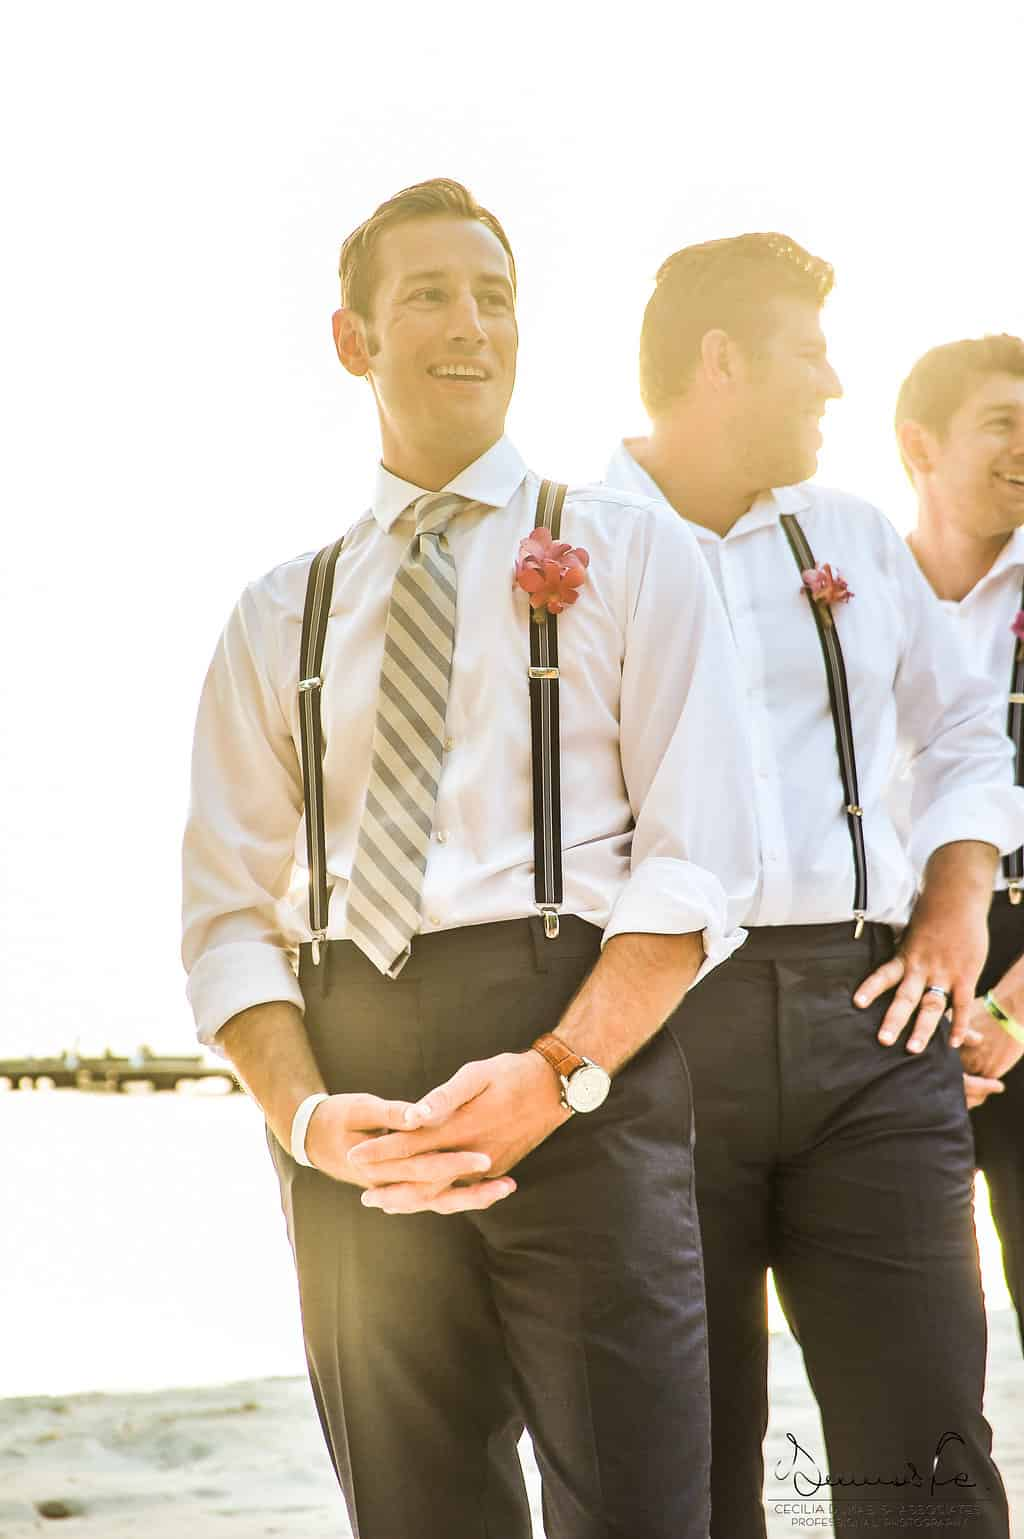 islamujeres-zama-weddingphotography-lindseysalvatore47